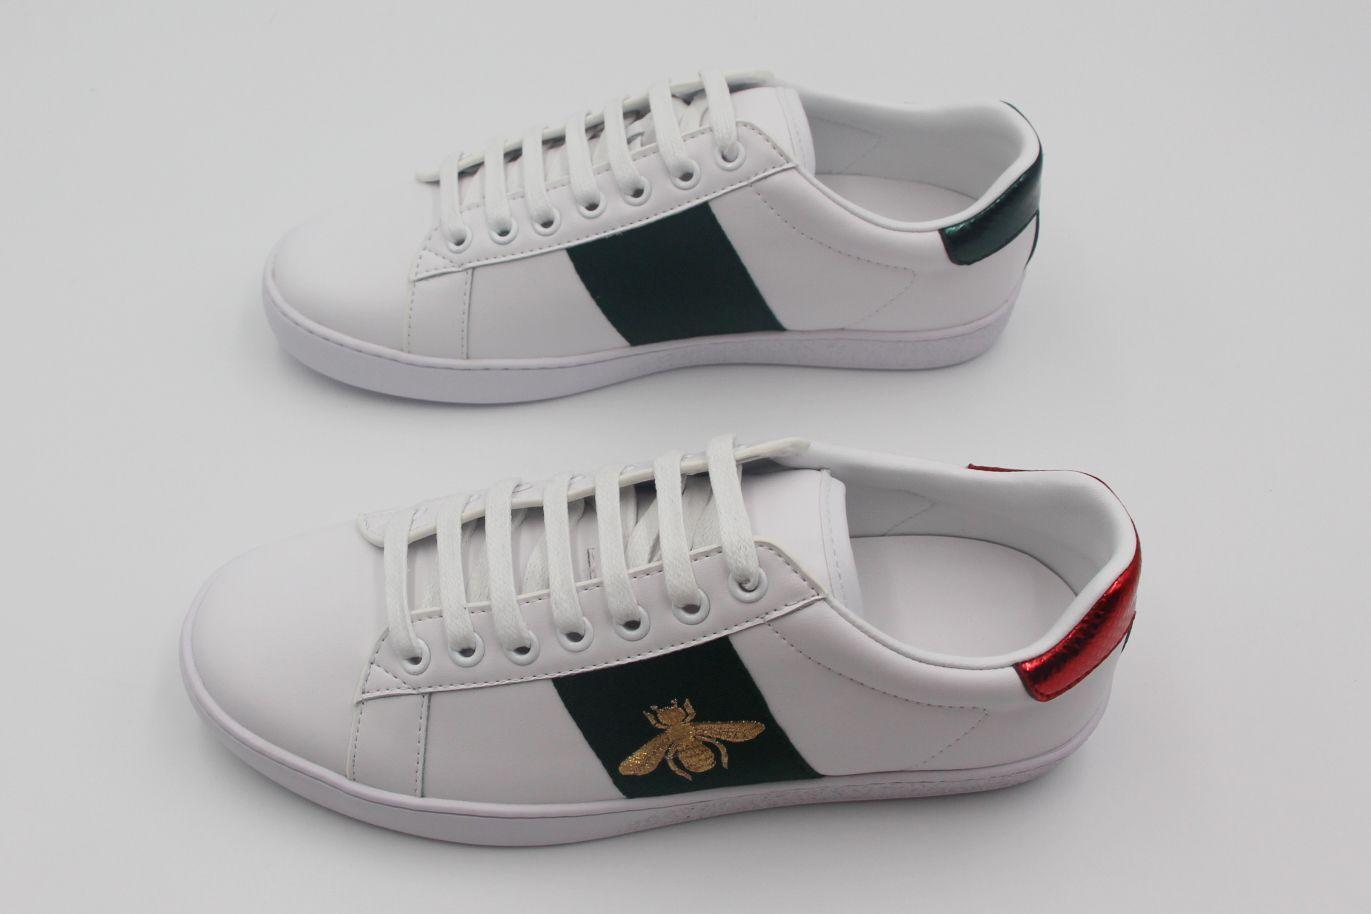 Moda mulher homem sapatos lace-up sapatos liso tigre cobra bordado senhora sneeke menino sapato sapato branco sapatos